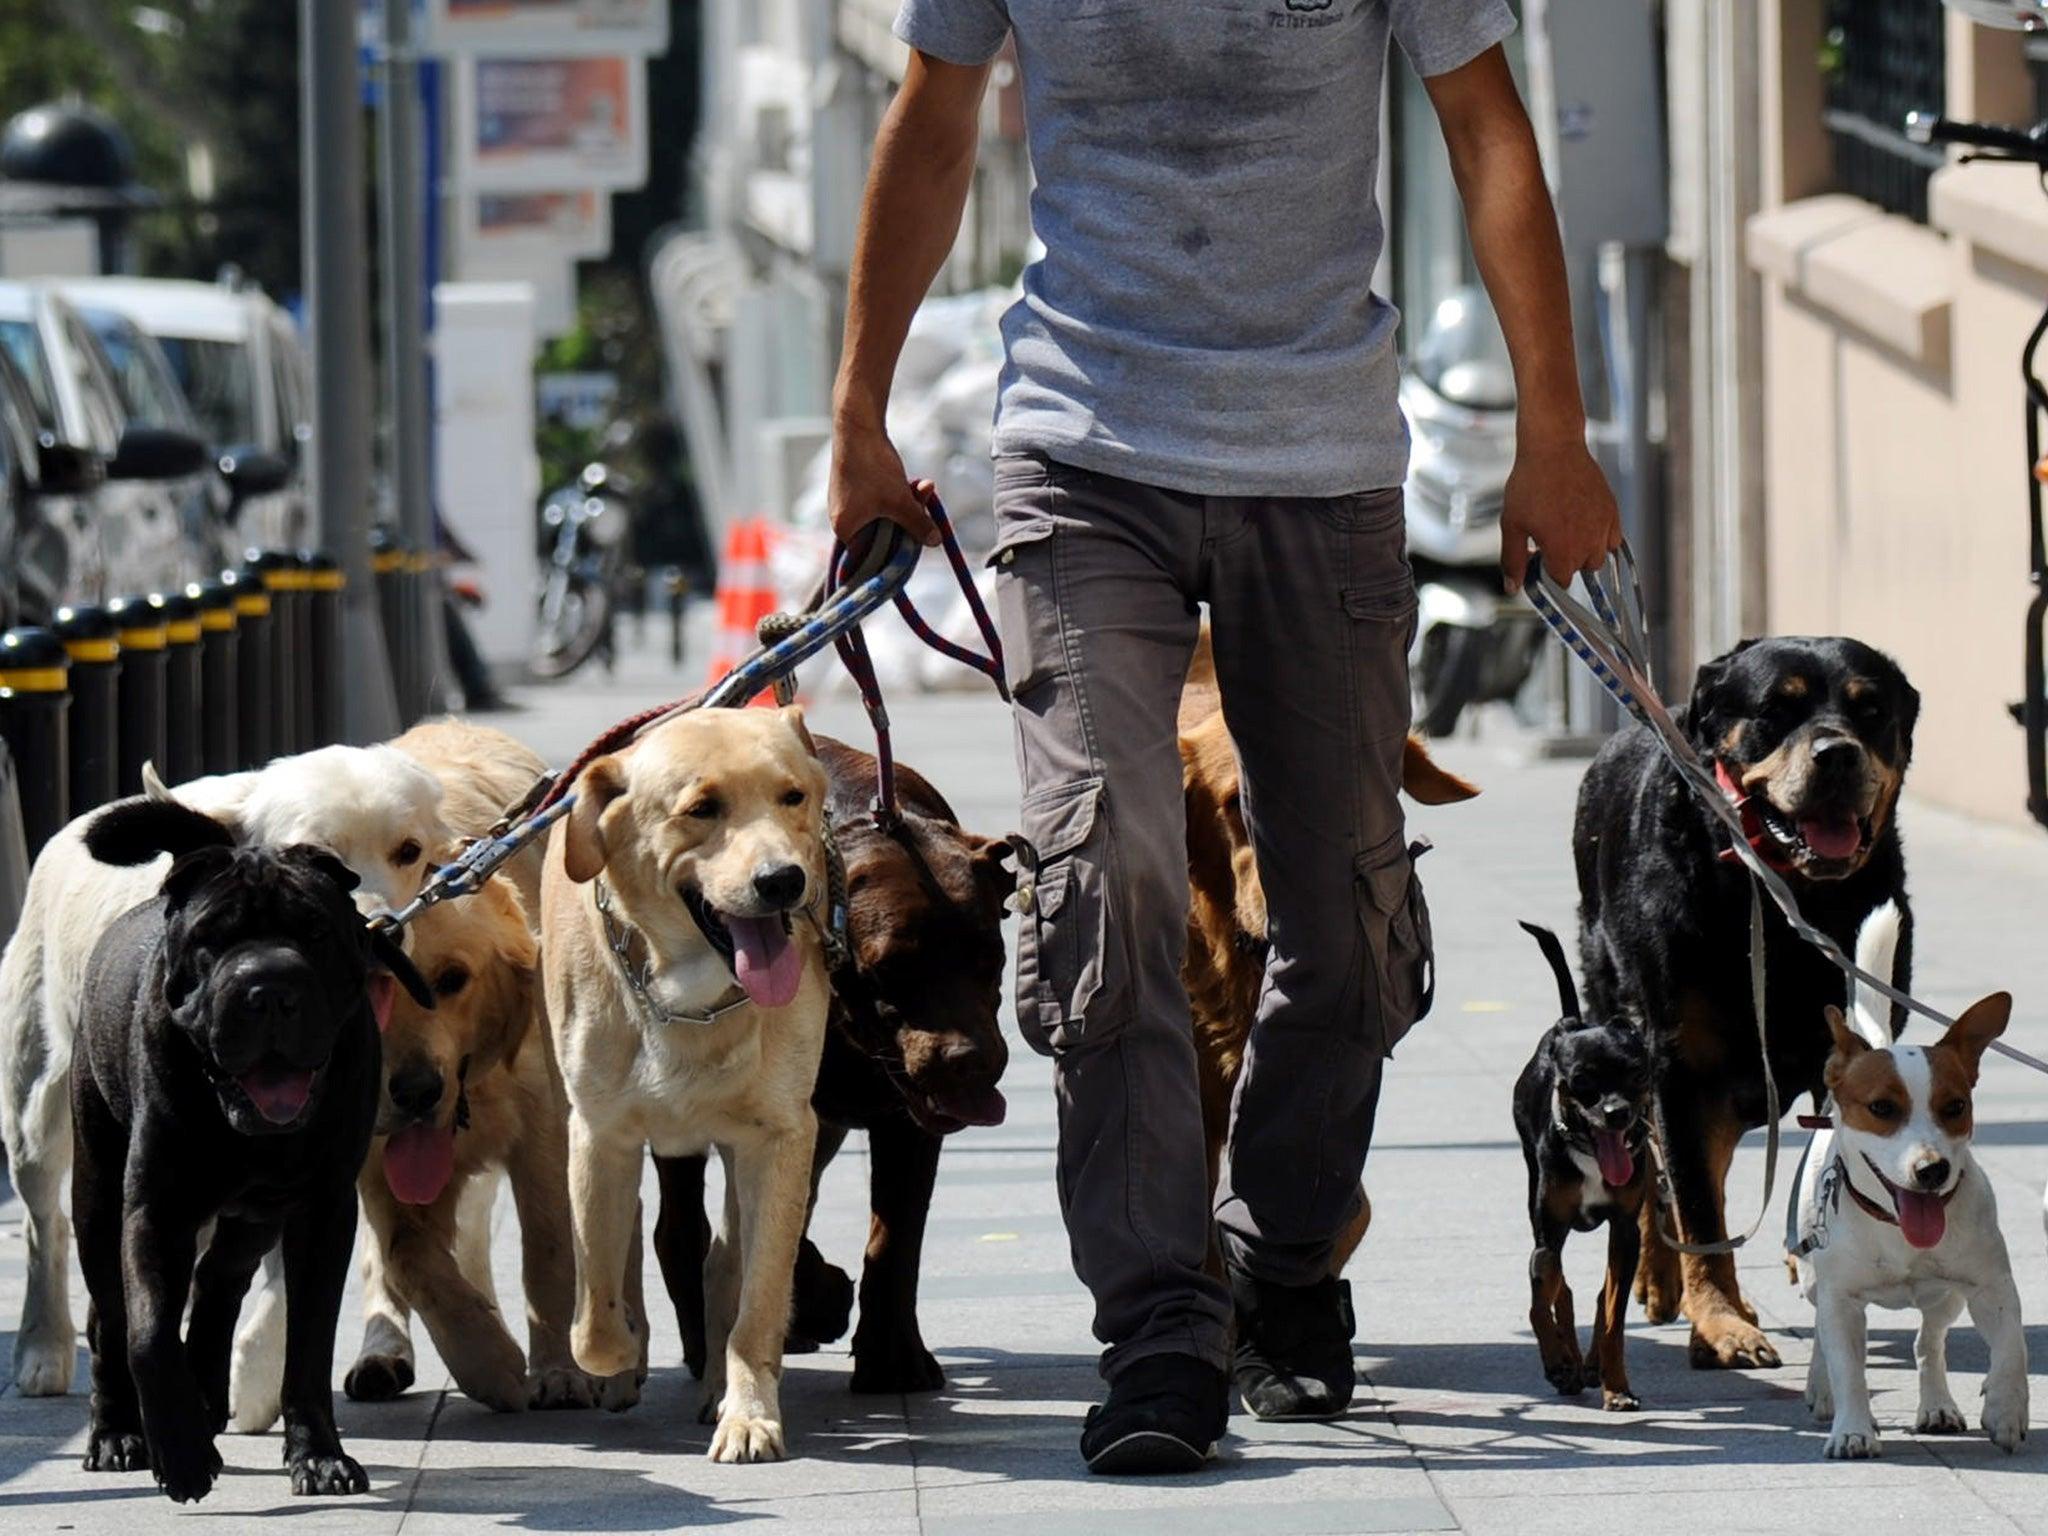 UK suffering 'absolutely disgusting' dog poo plague amid coronavirus pandemic